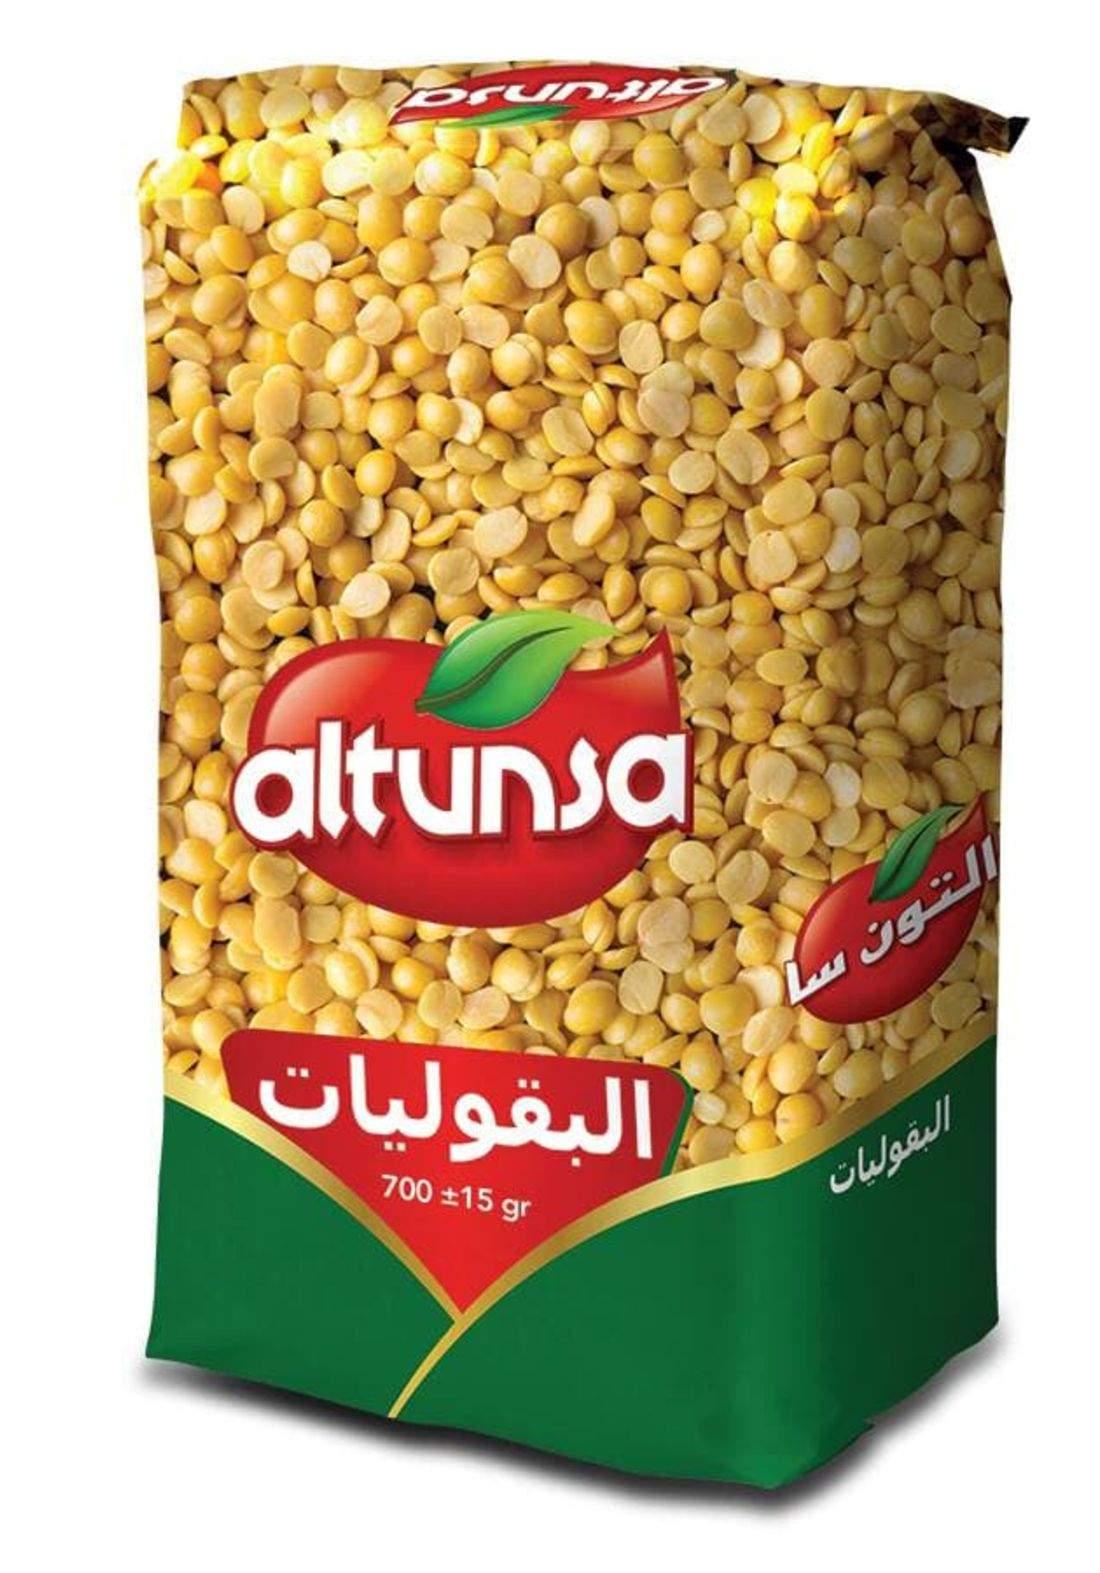 Altunsa 700g التون سا حمص مجروش